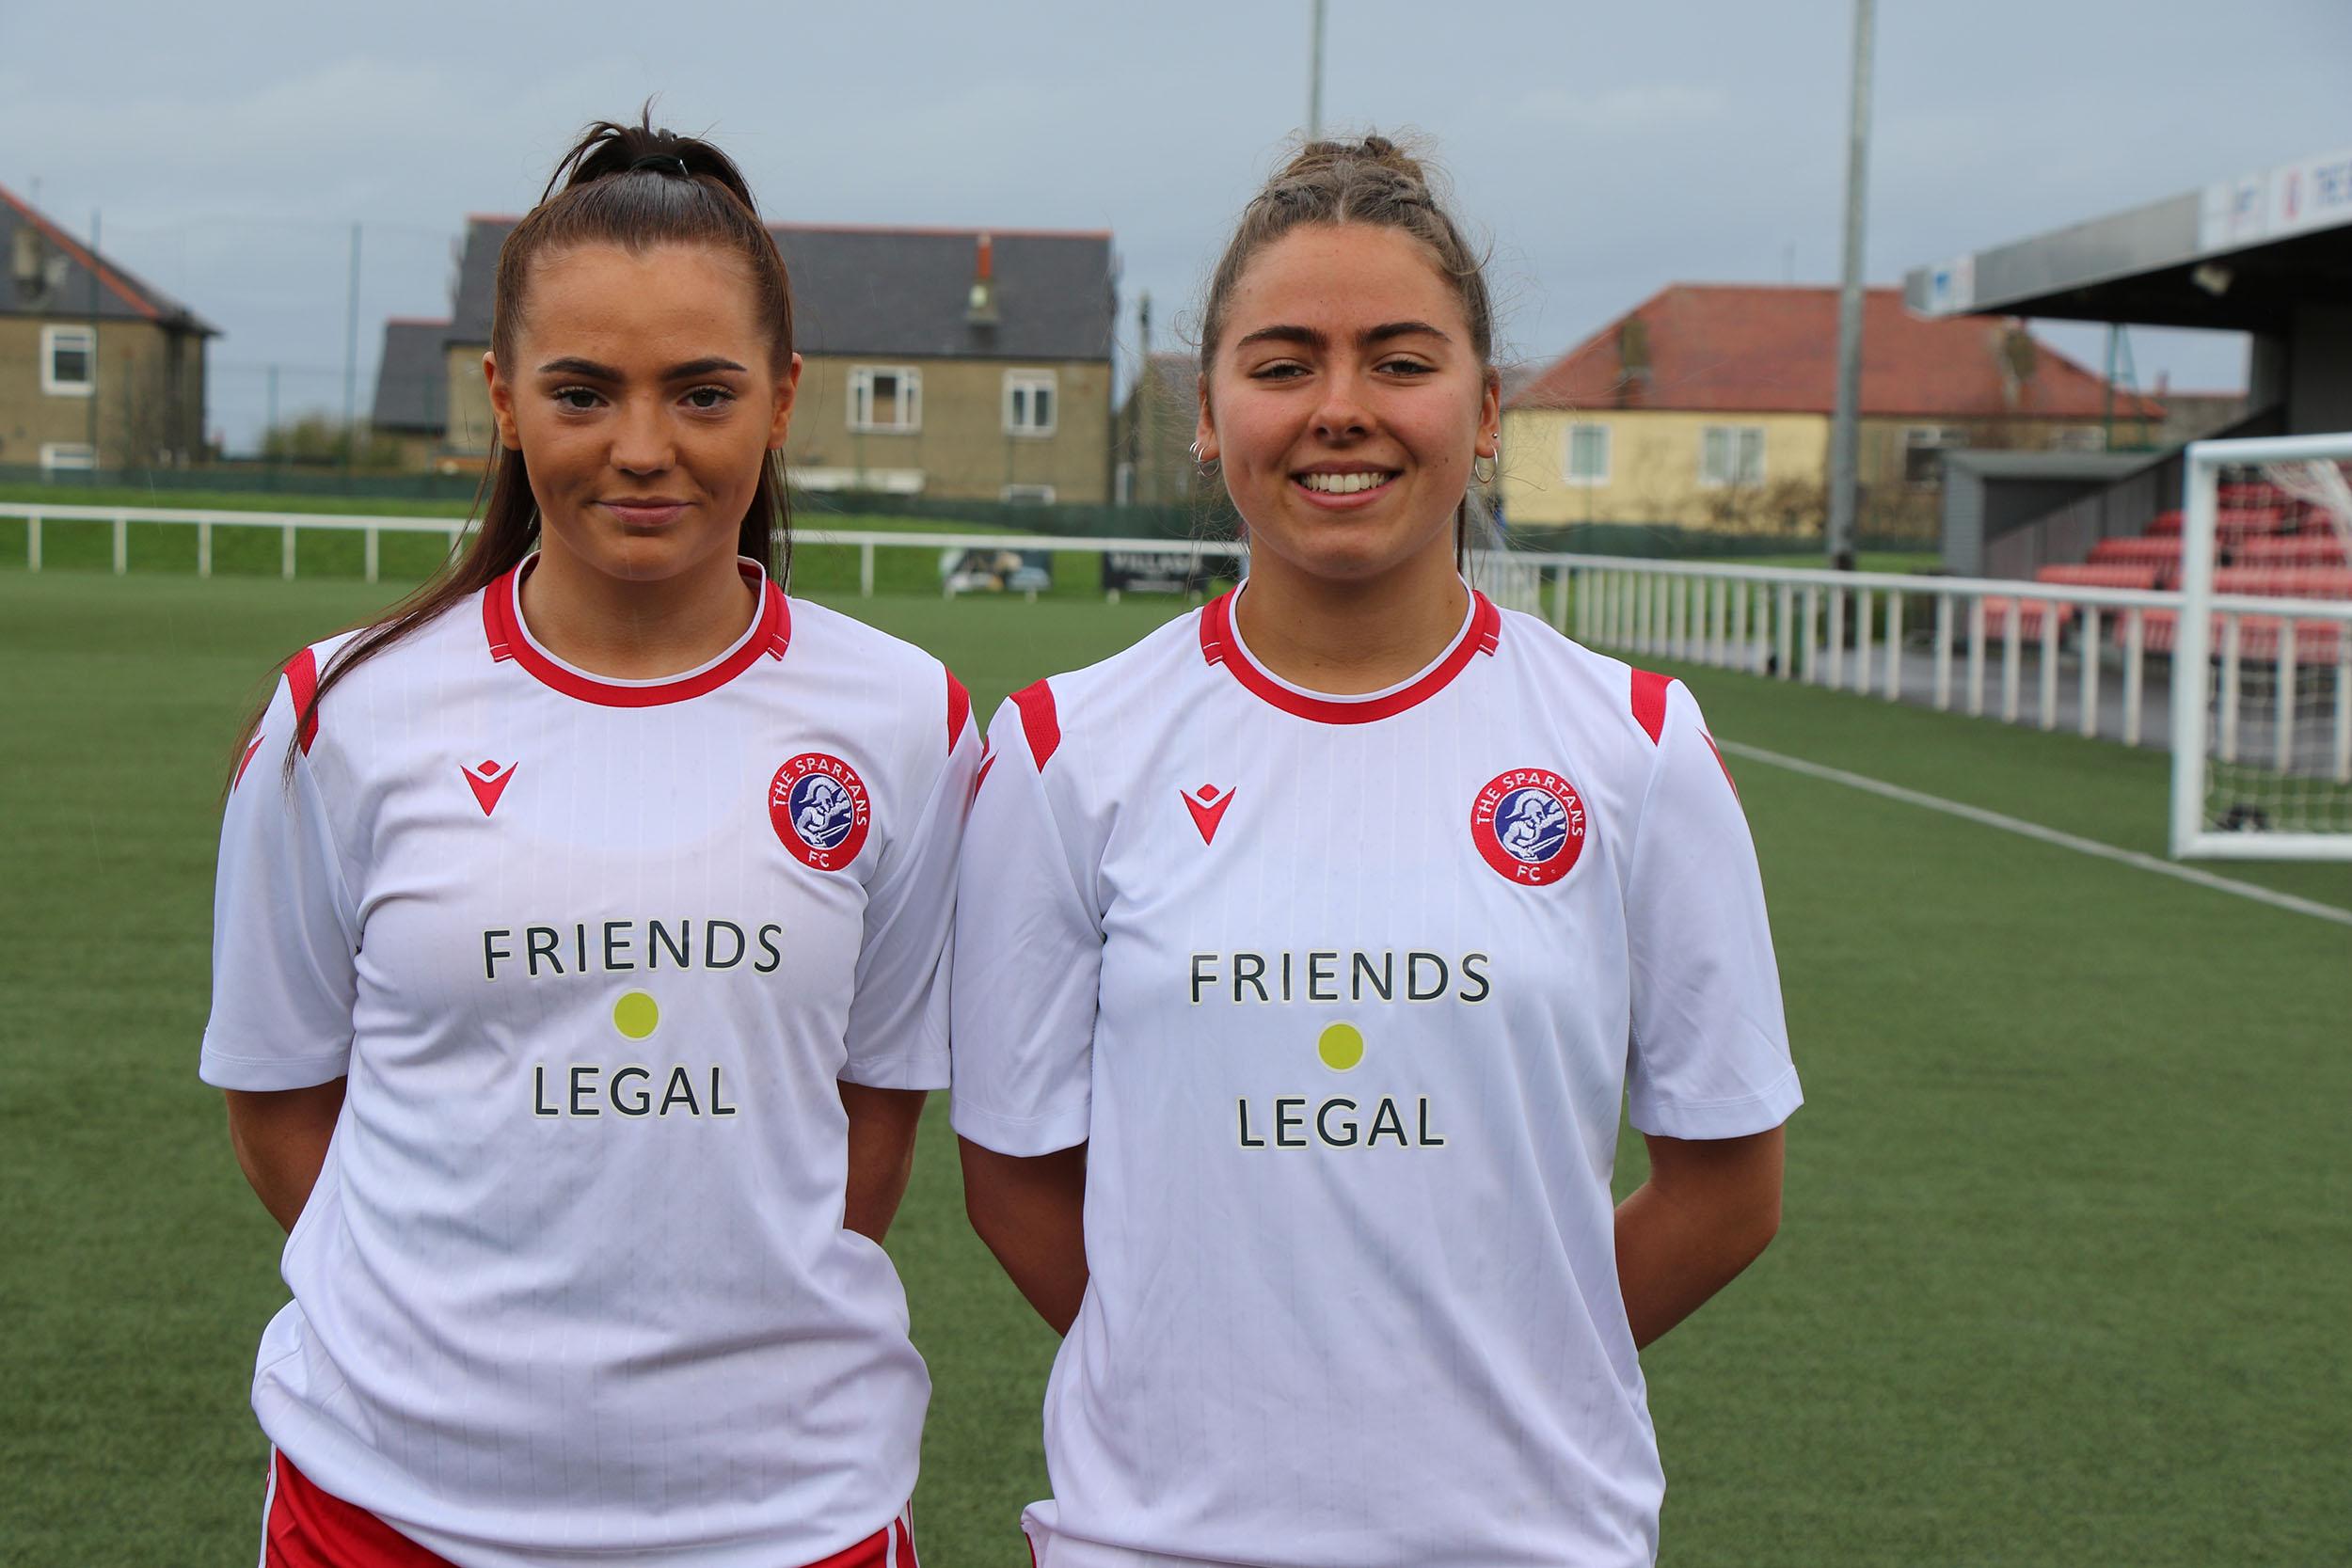 Friends Legal Proudly Sponsors Spartans Football Club Women's Team